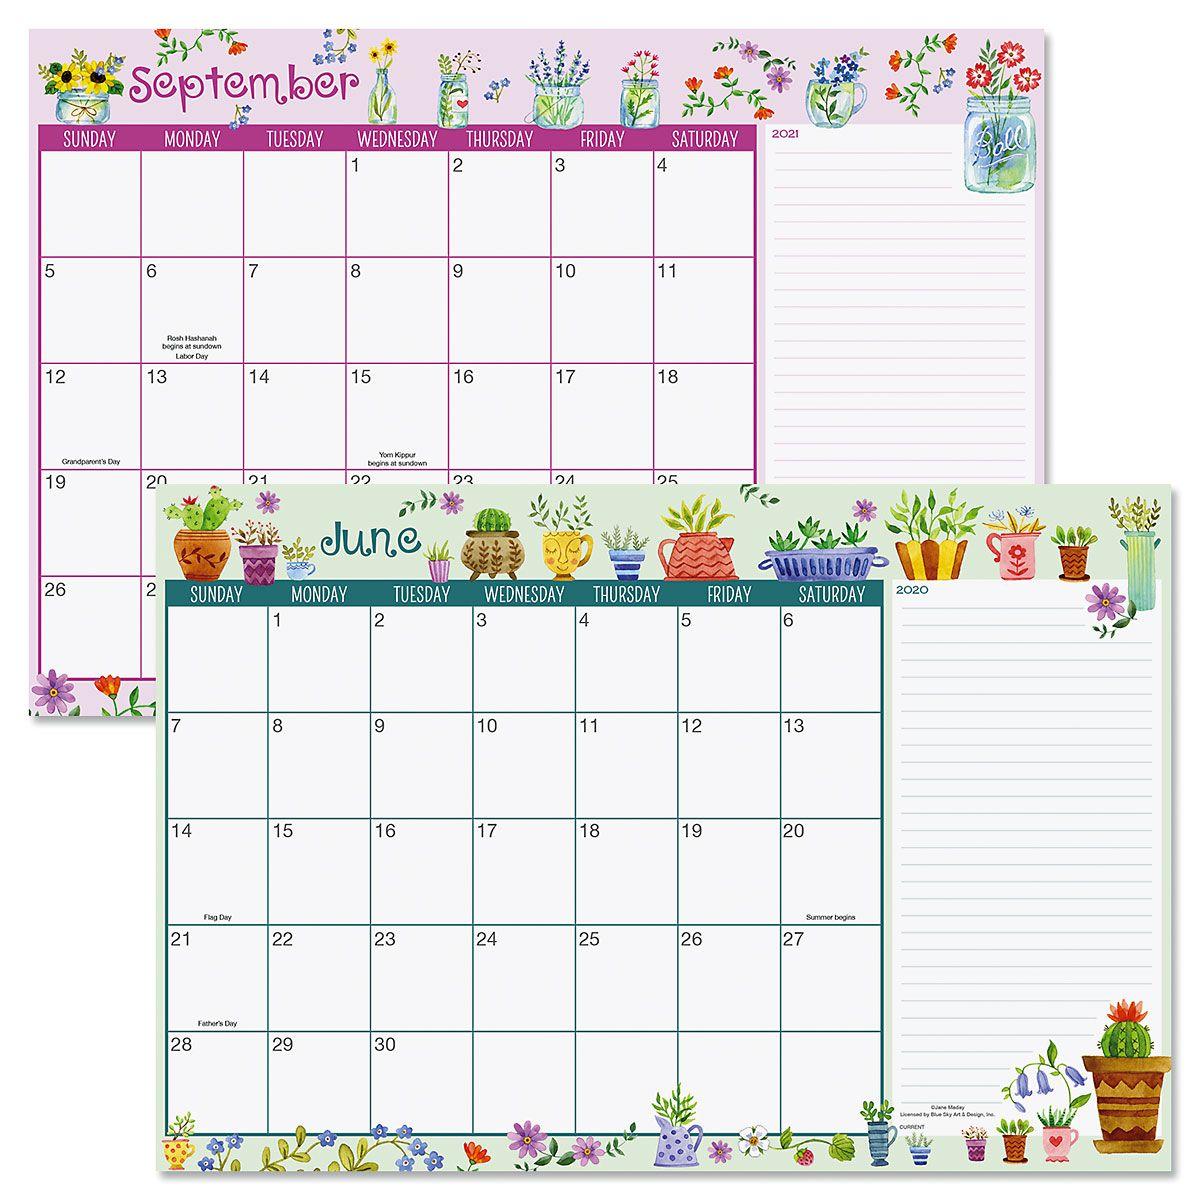 2020-2021 Whimsy Borders Calendar Pad